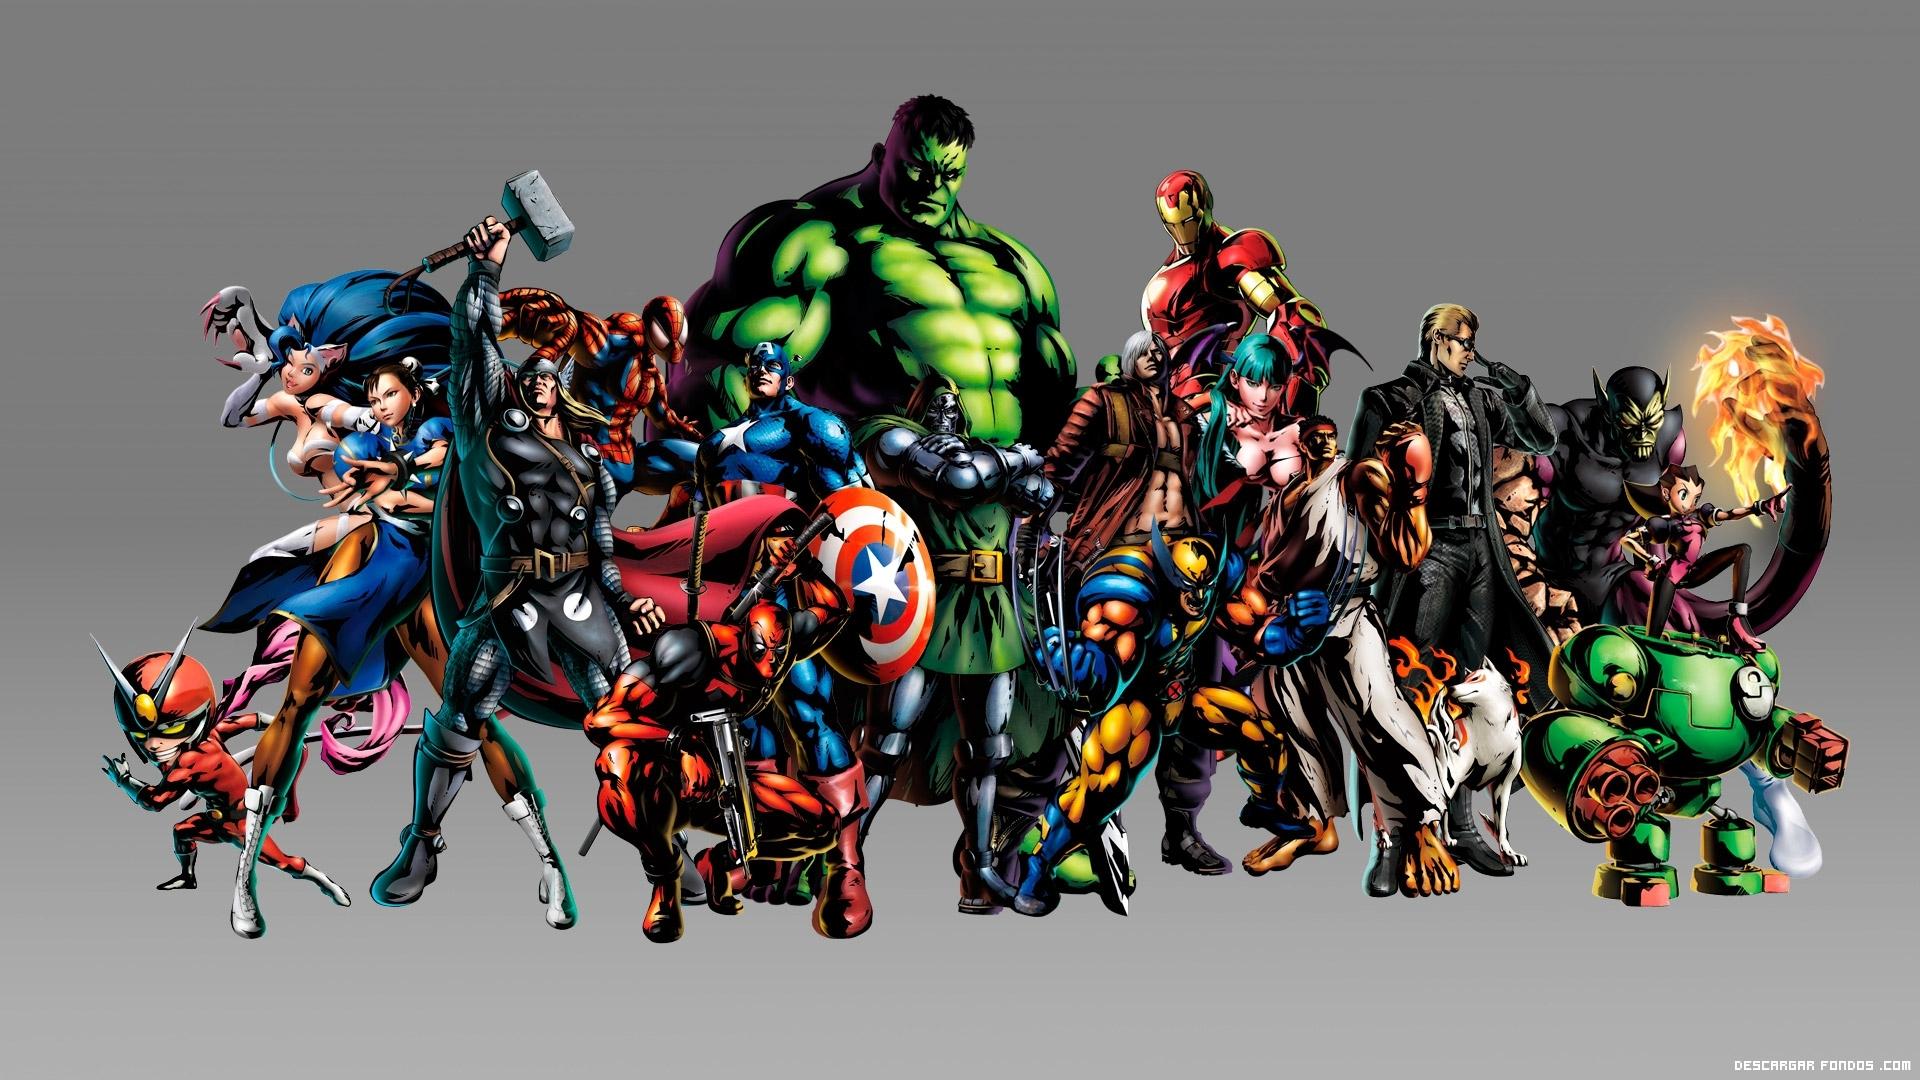 download Marvel Super Heroes Exclusive HD Wallpapers 6647 1920x1080